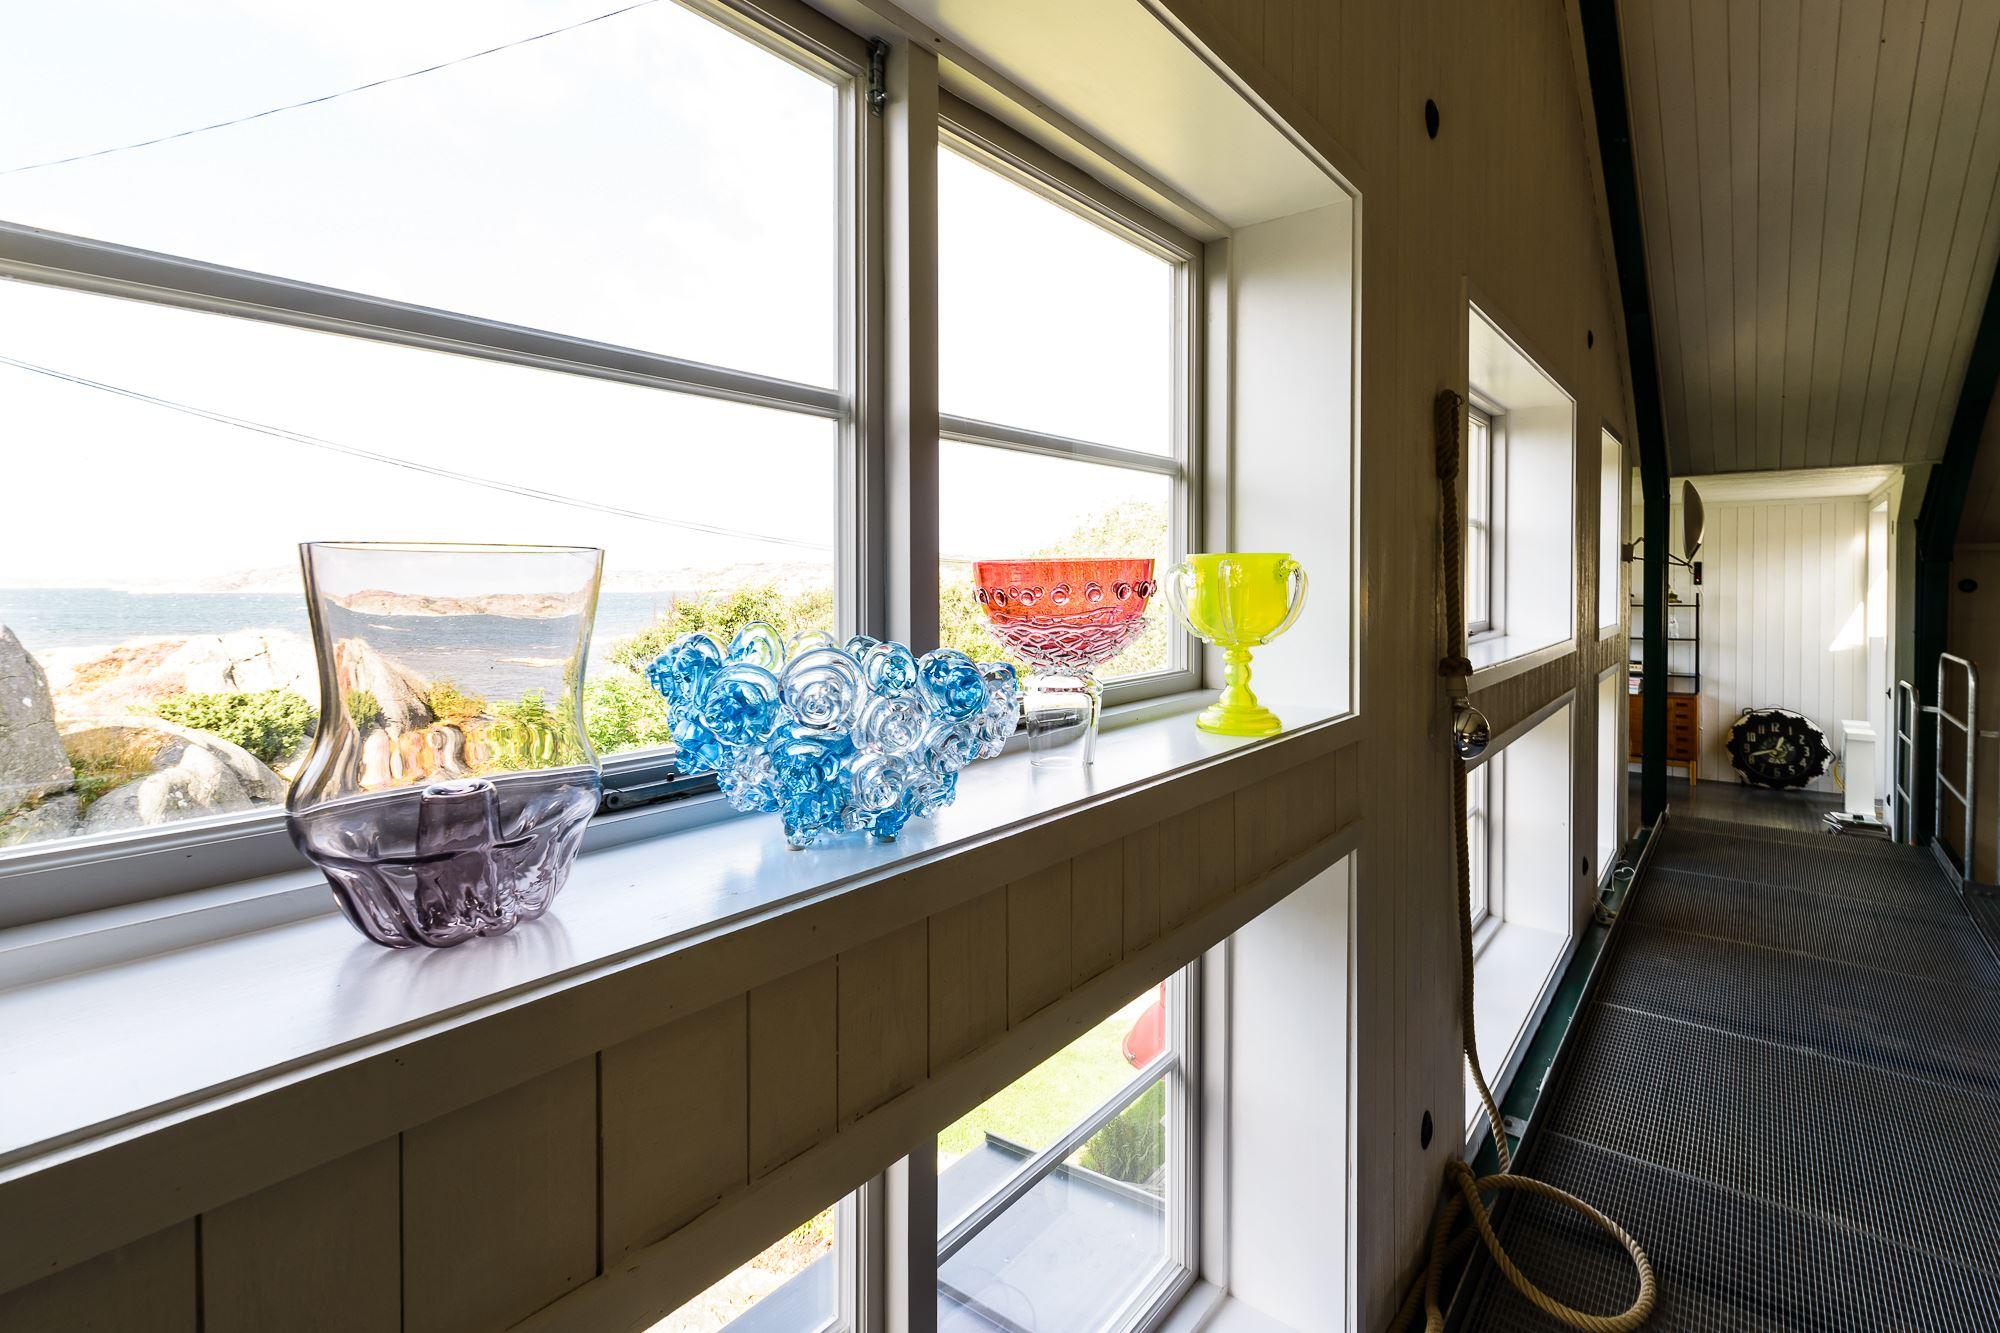 Lådfabriken –a stunning, contemporary seaside stay